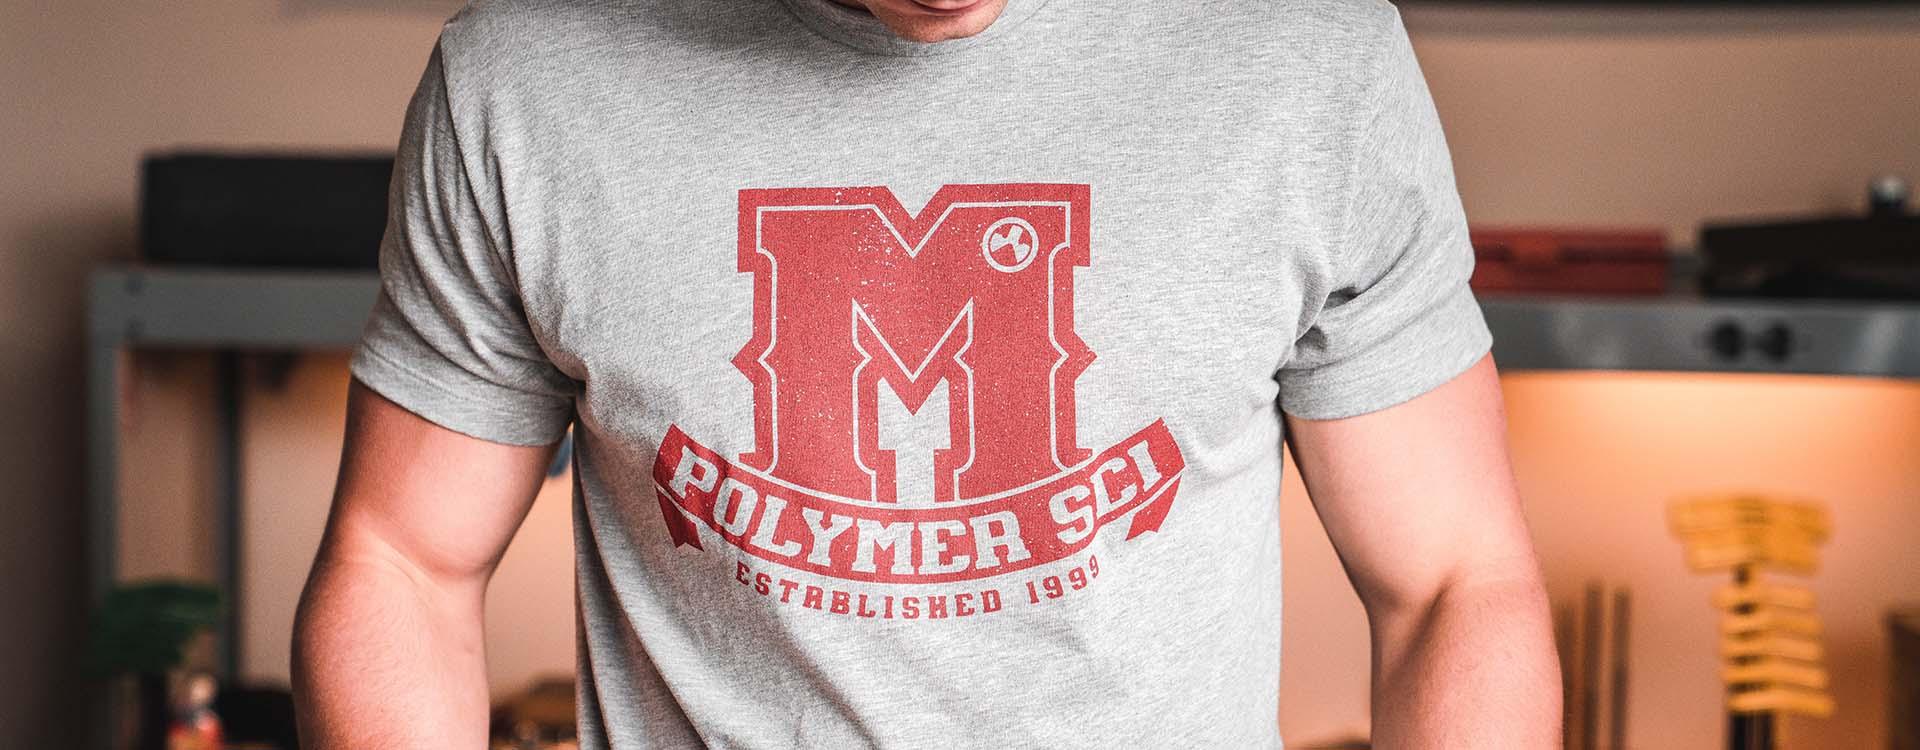 Magpul University Blend T-Shirt on man in workshop